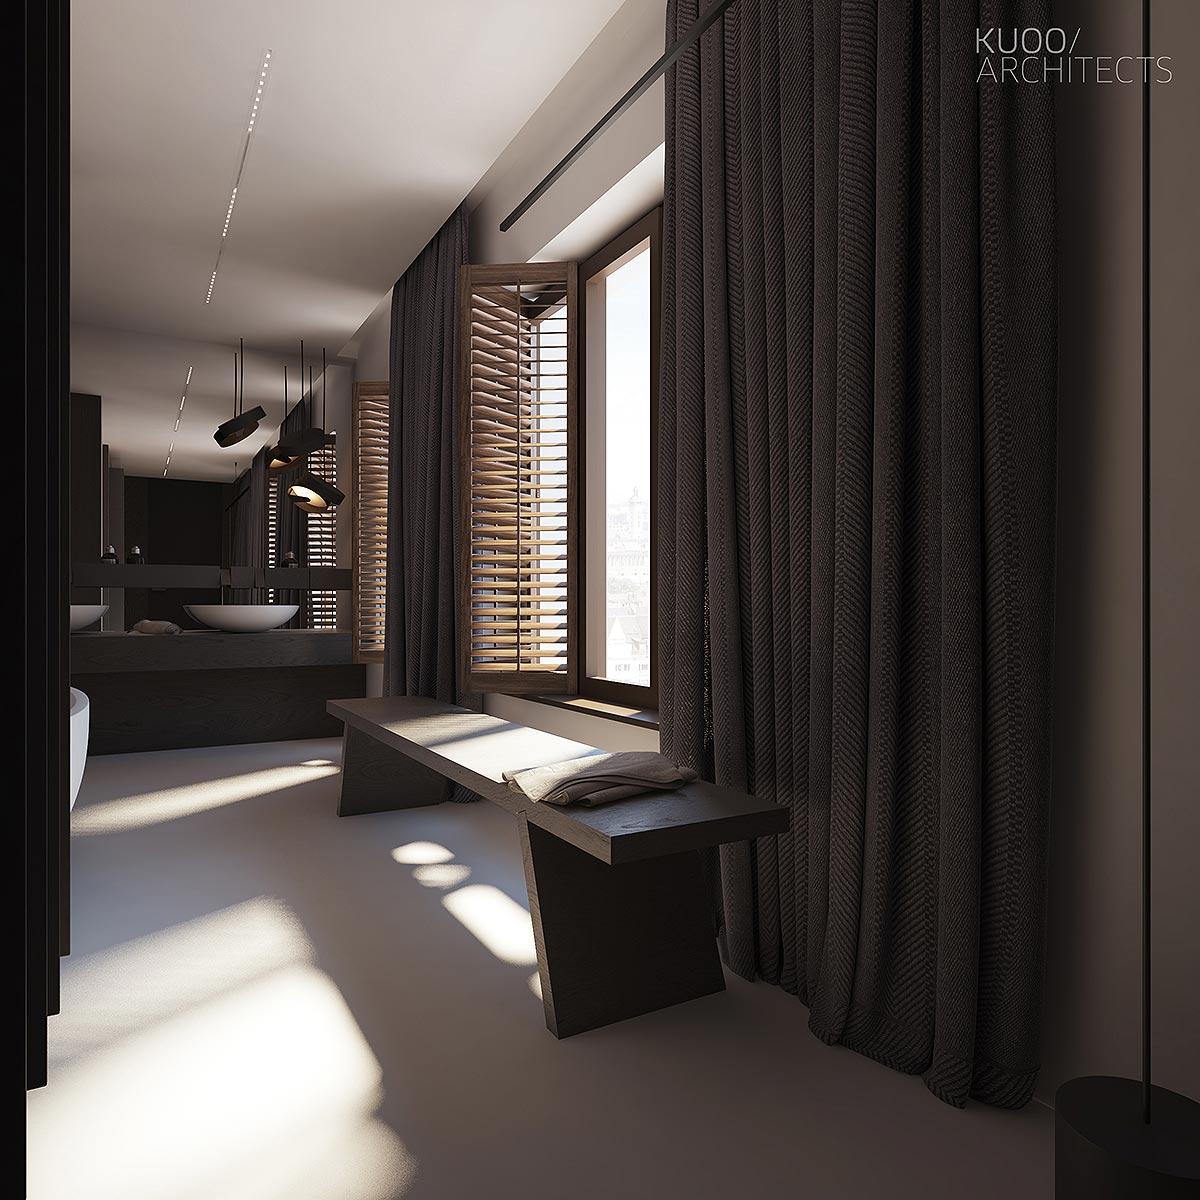 N_kuoo_architects_warsaw_minimal_interiors_contemporaryjpg